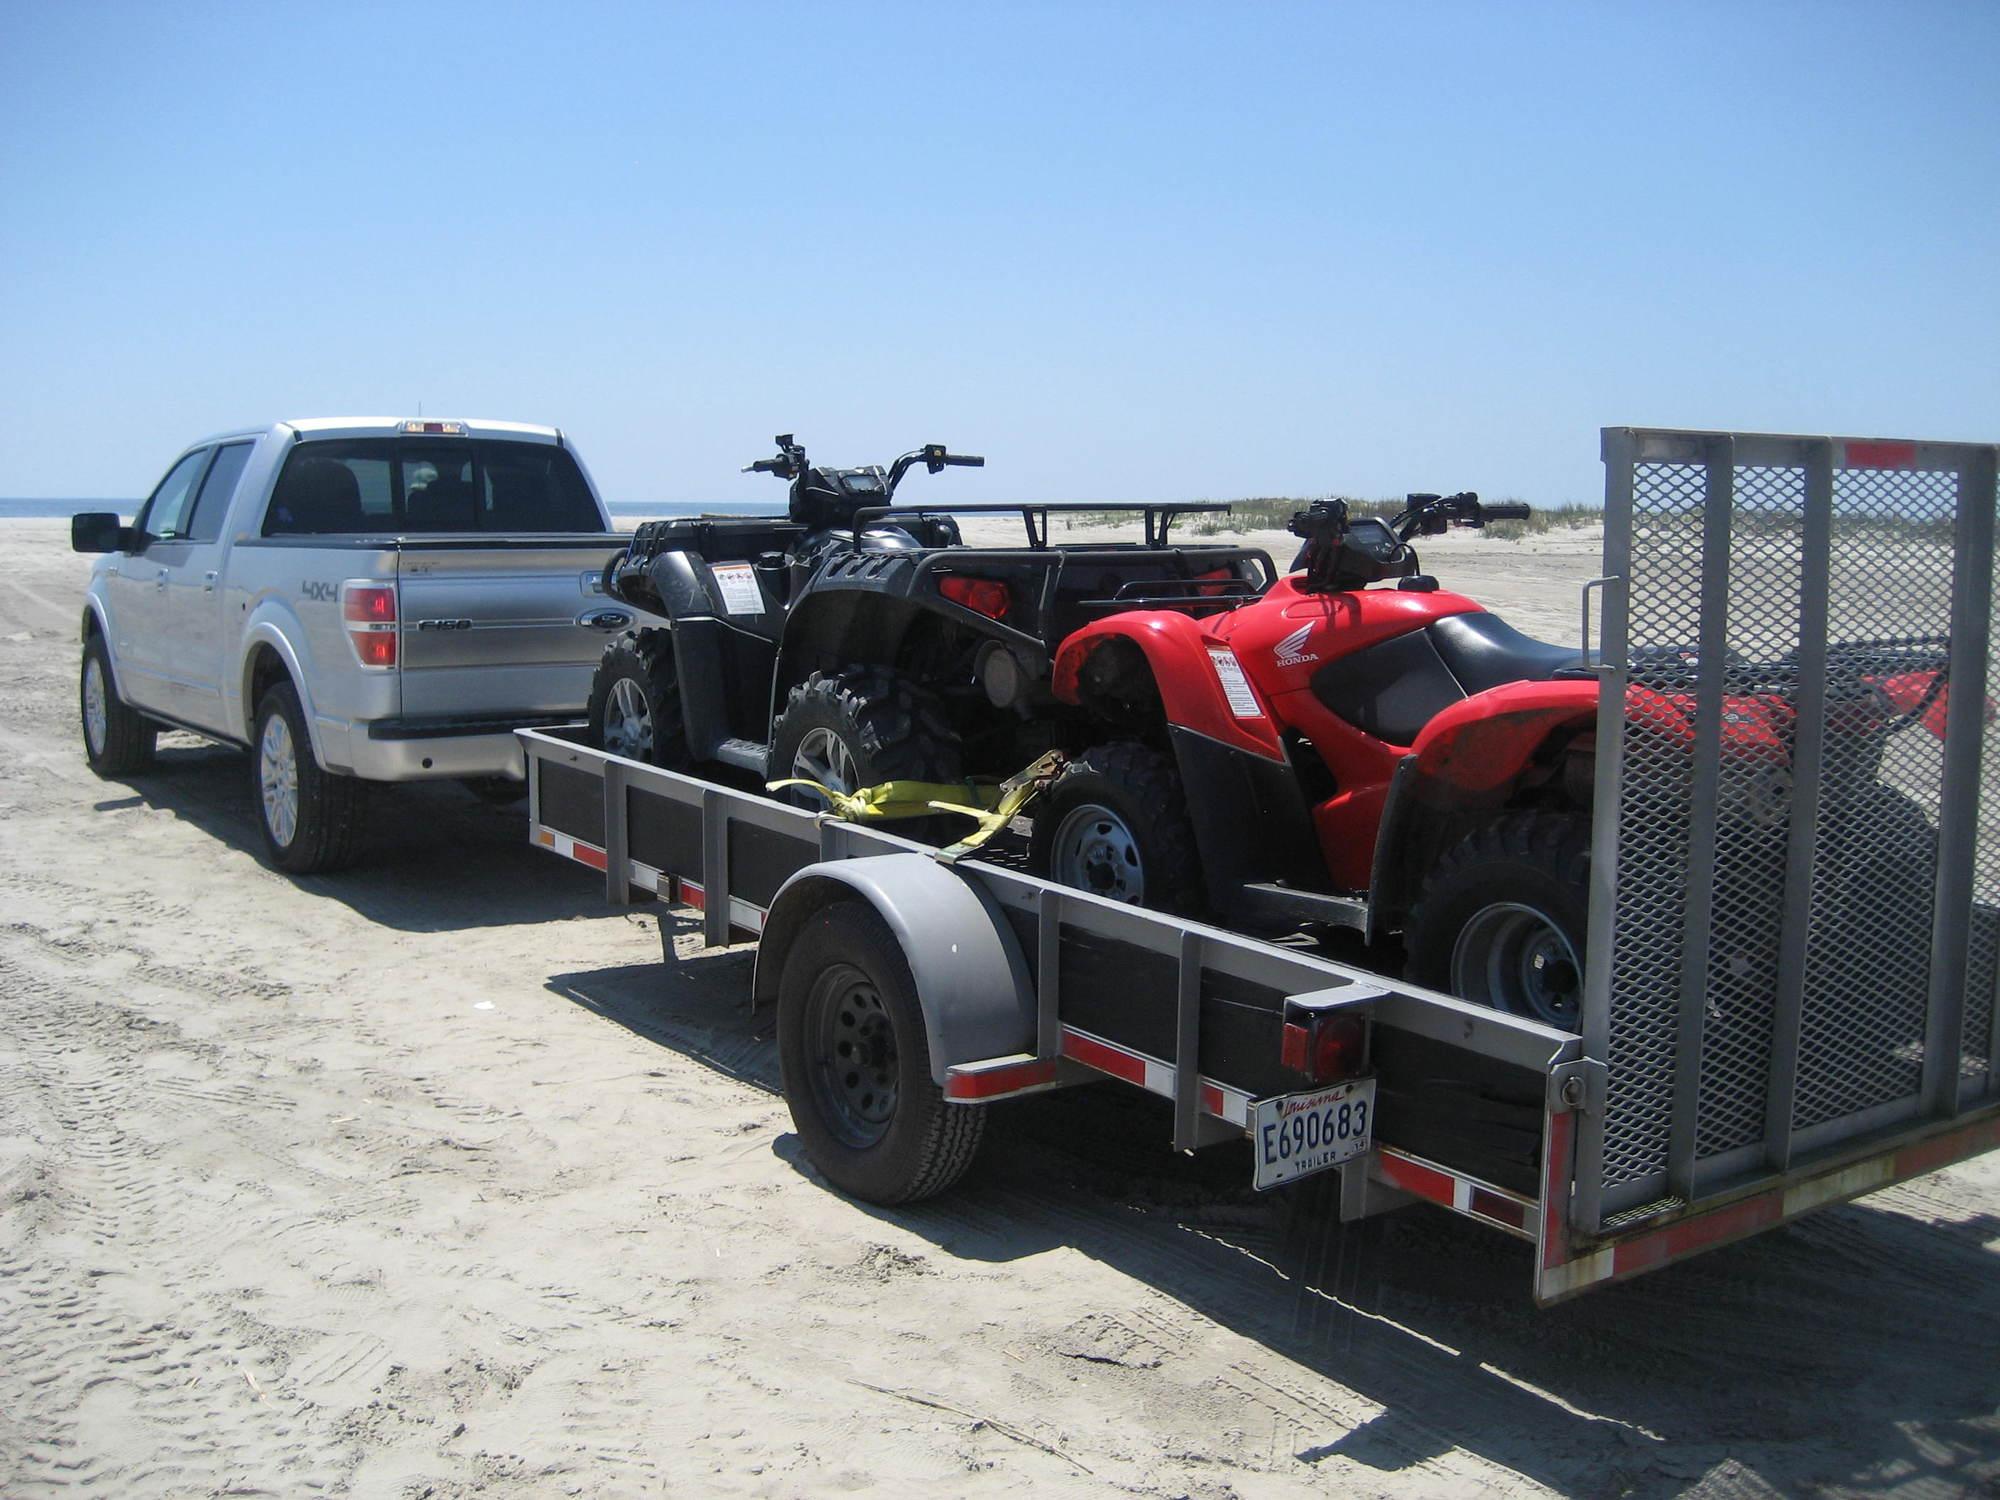 Heavy polaris 850 and a honda rancher 420